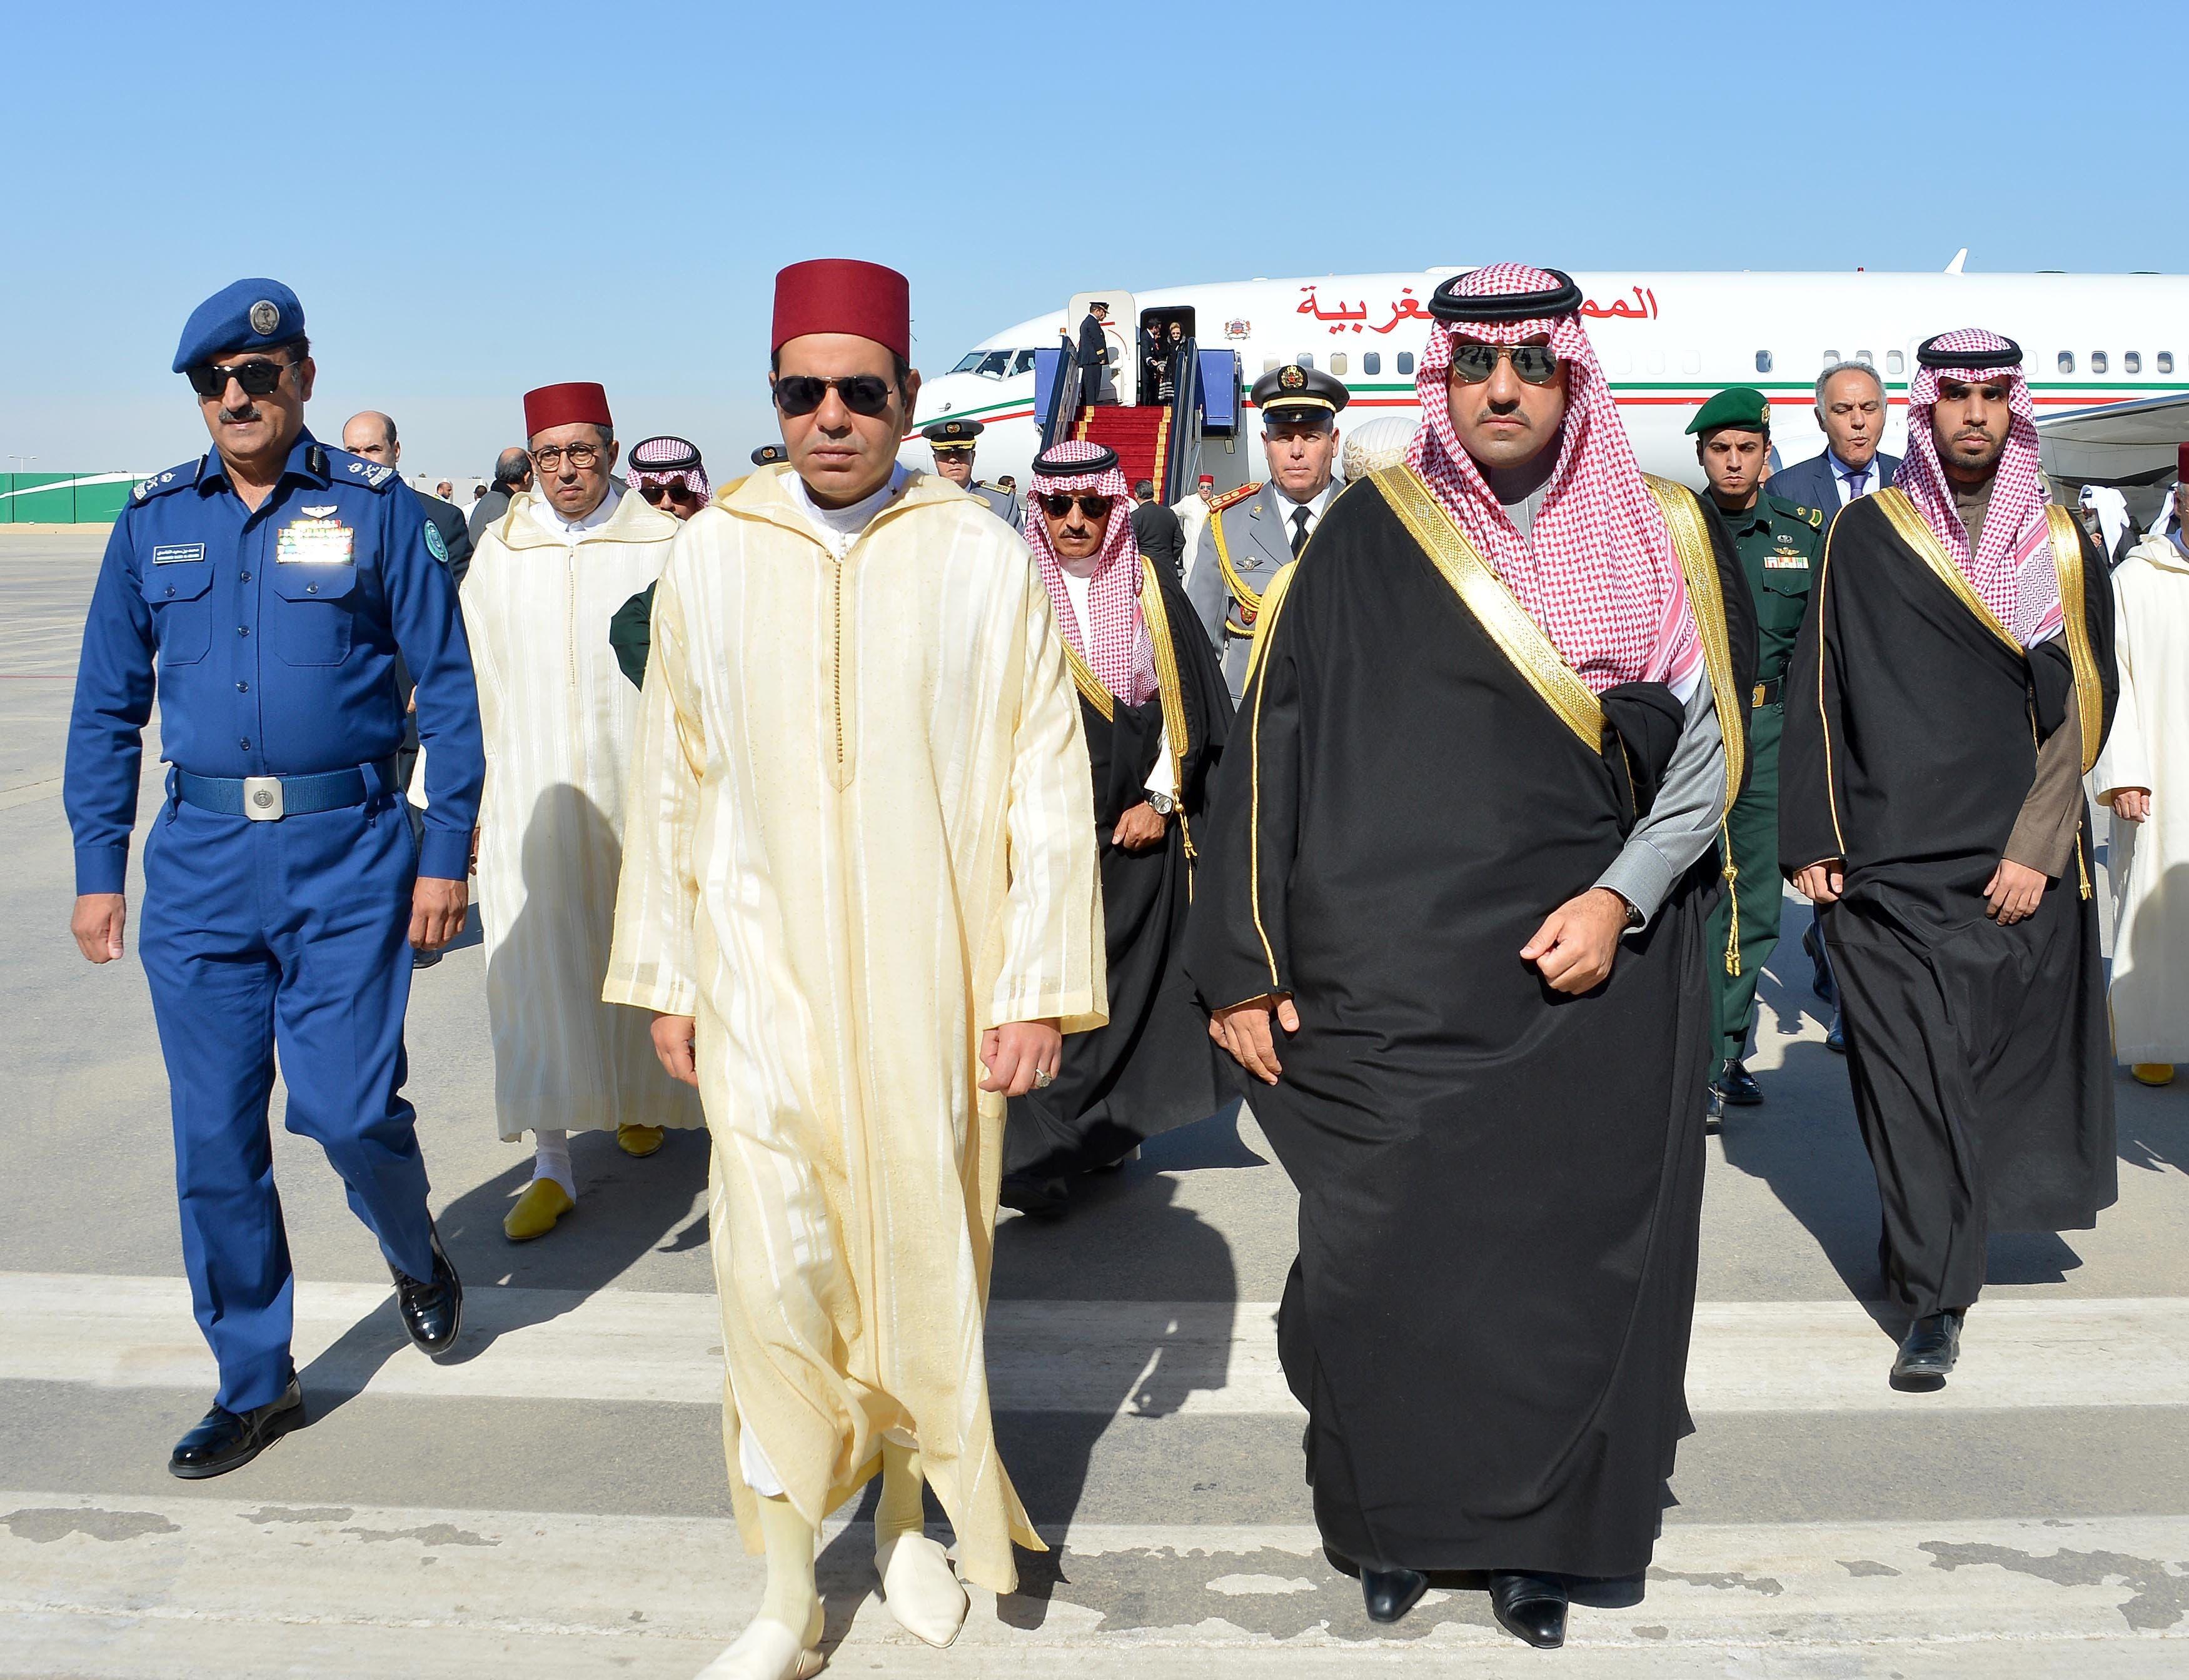 Saudi Prince and Emir of Riyadh Turki bin Abdullah bin Abdelaziz (C-R) welcoming Prince Rachid of Morocco. (AFP)